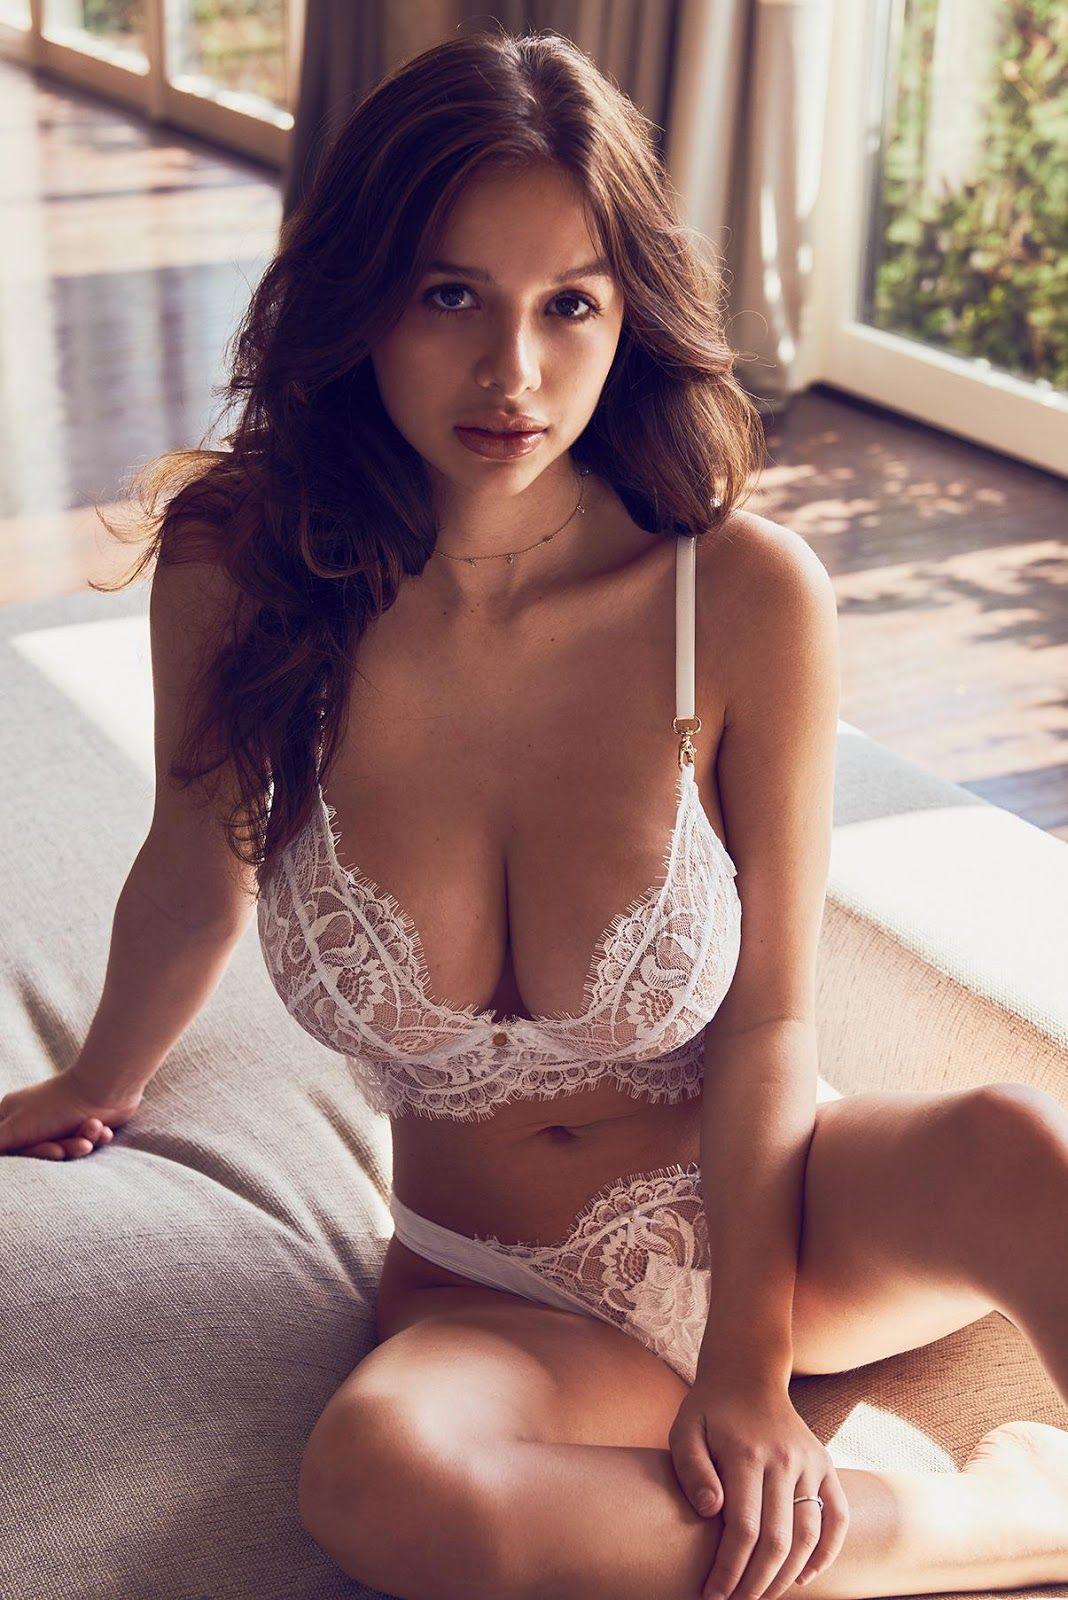 Selfie Sophie Mudd nude (86 photo), Sexy, Leaked, Boobs, underwear 2006